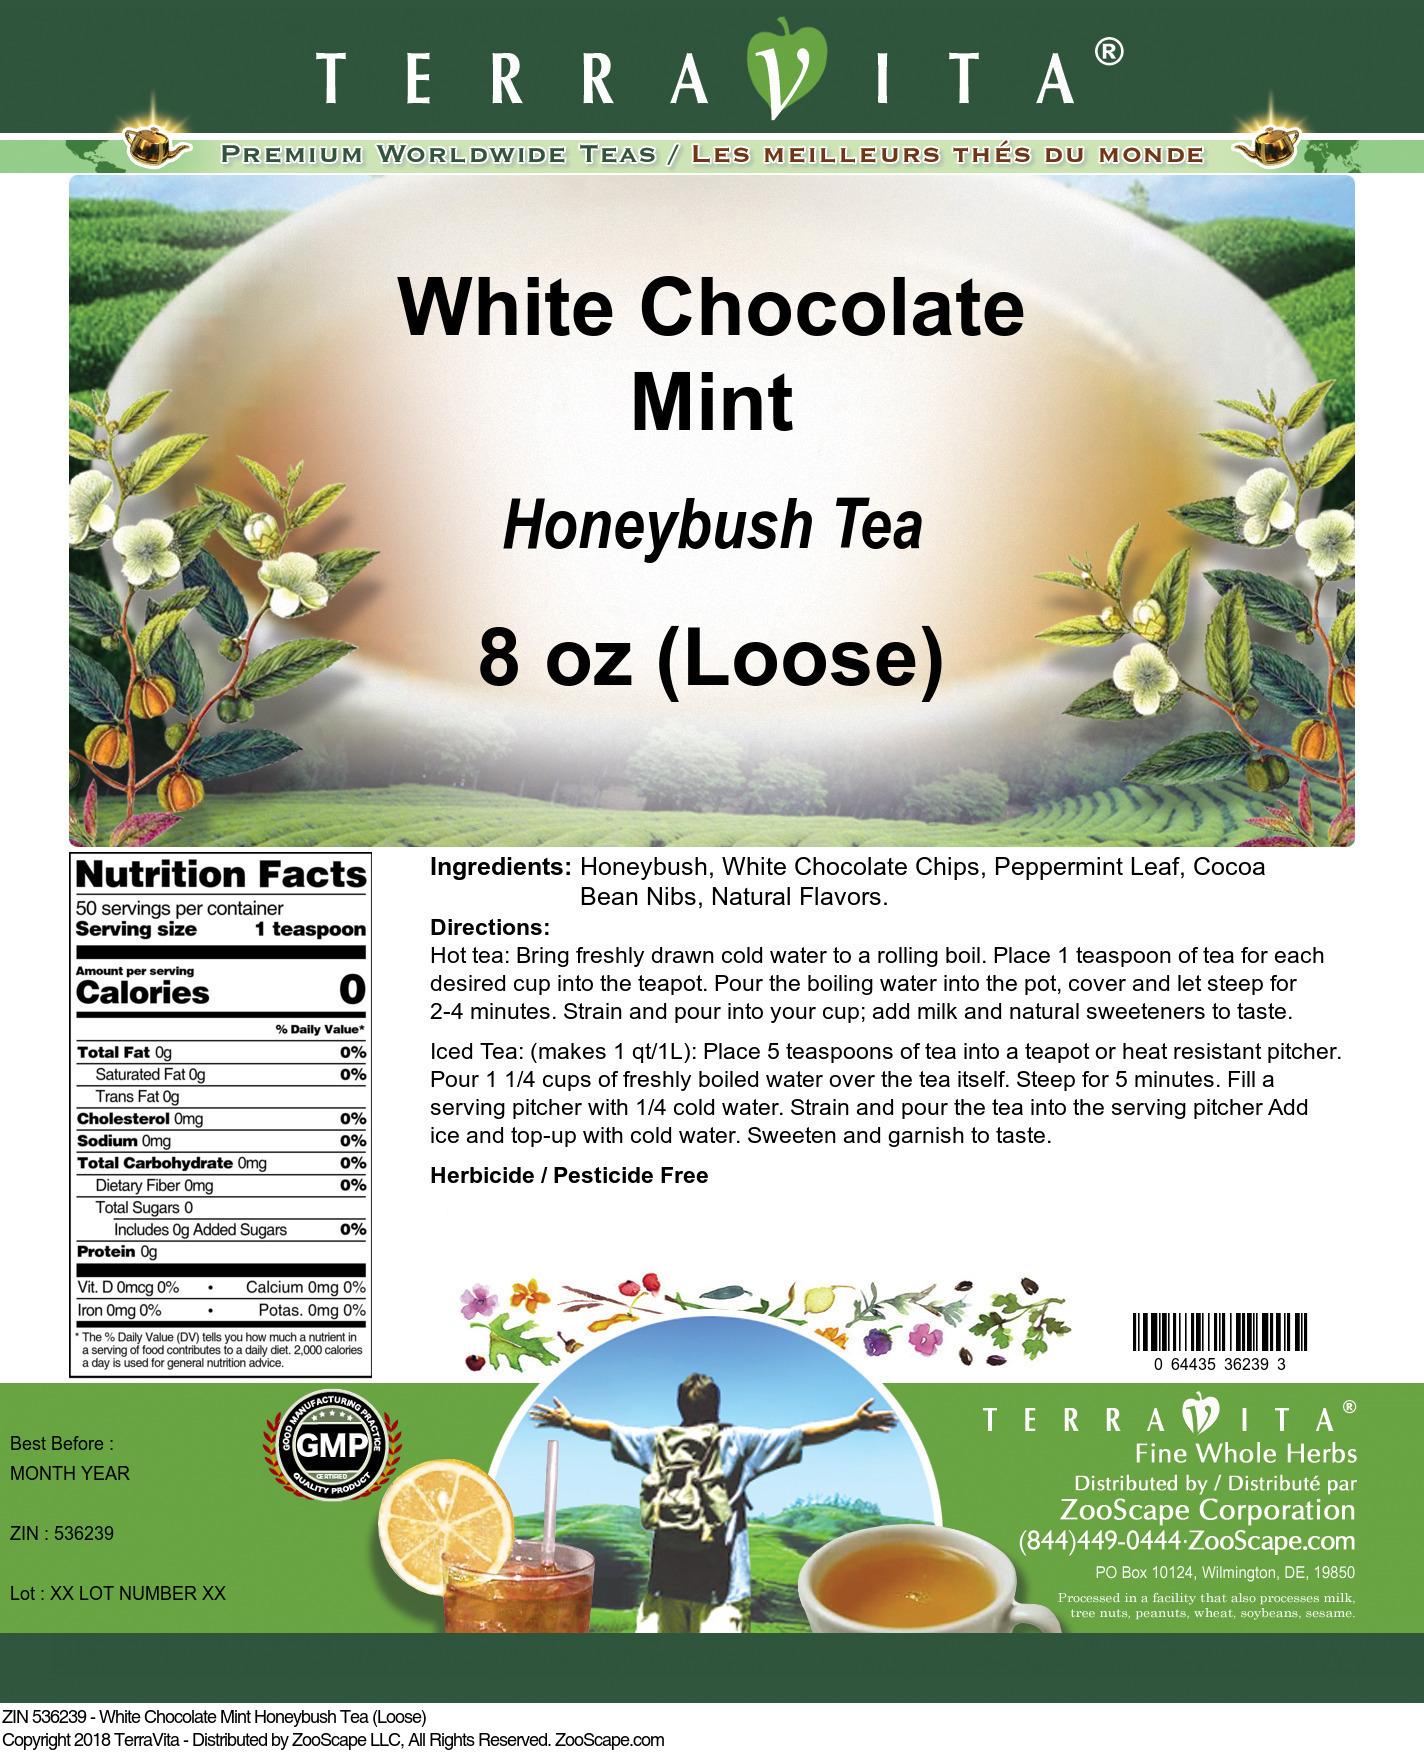 White Chocolate Mint Honeybush Tea